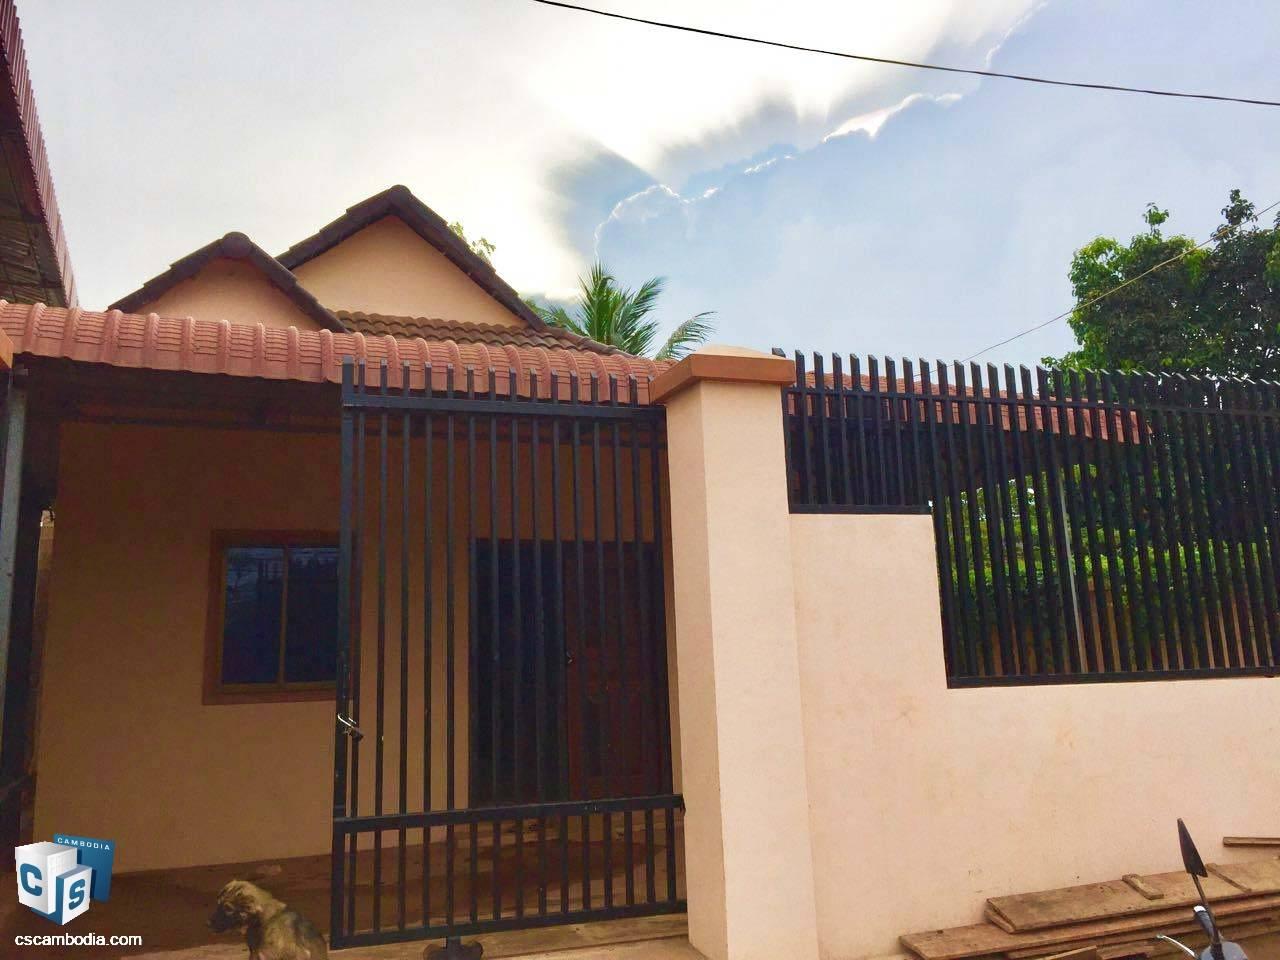 1 Bedroom House – For Rent – Phnea Chey Village – Svay Dangkum Commune – Siem Reap